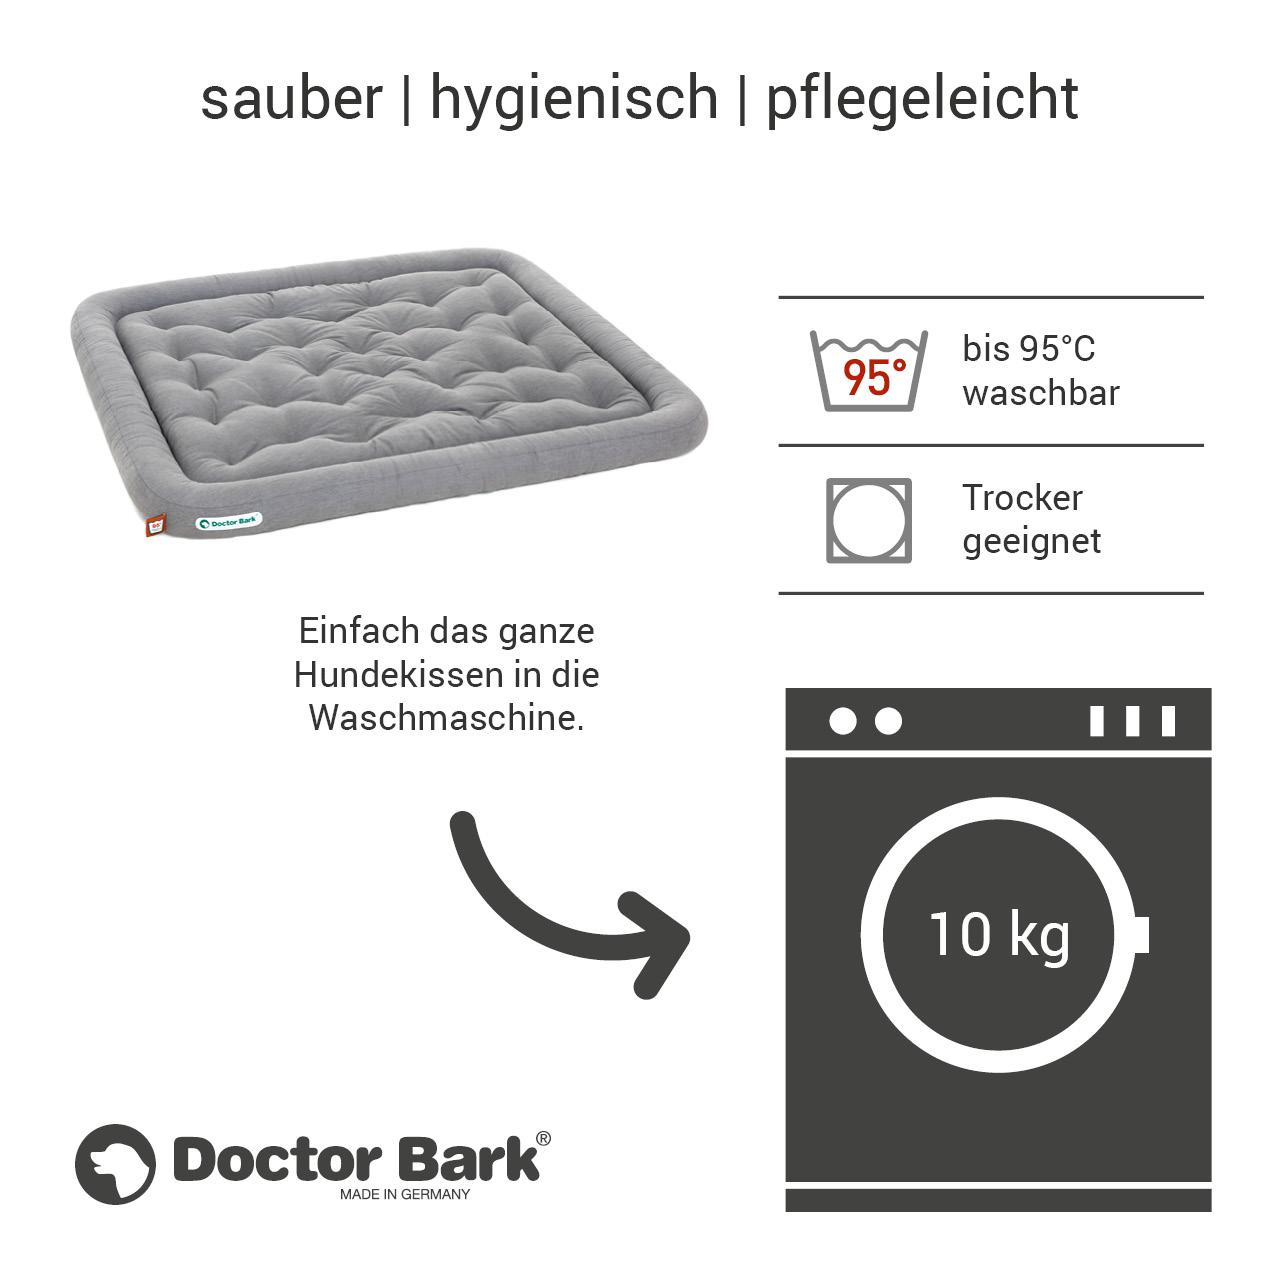 Lounge-Hundekissen / Hundebett orthopädisch Doctor Bark waschbar hellgrau - Gr. XXL